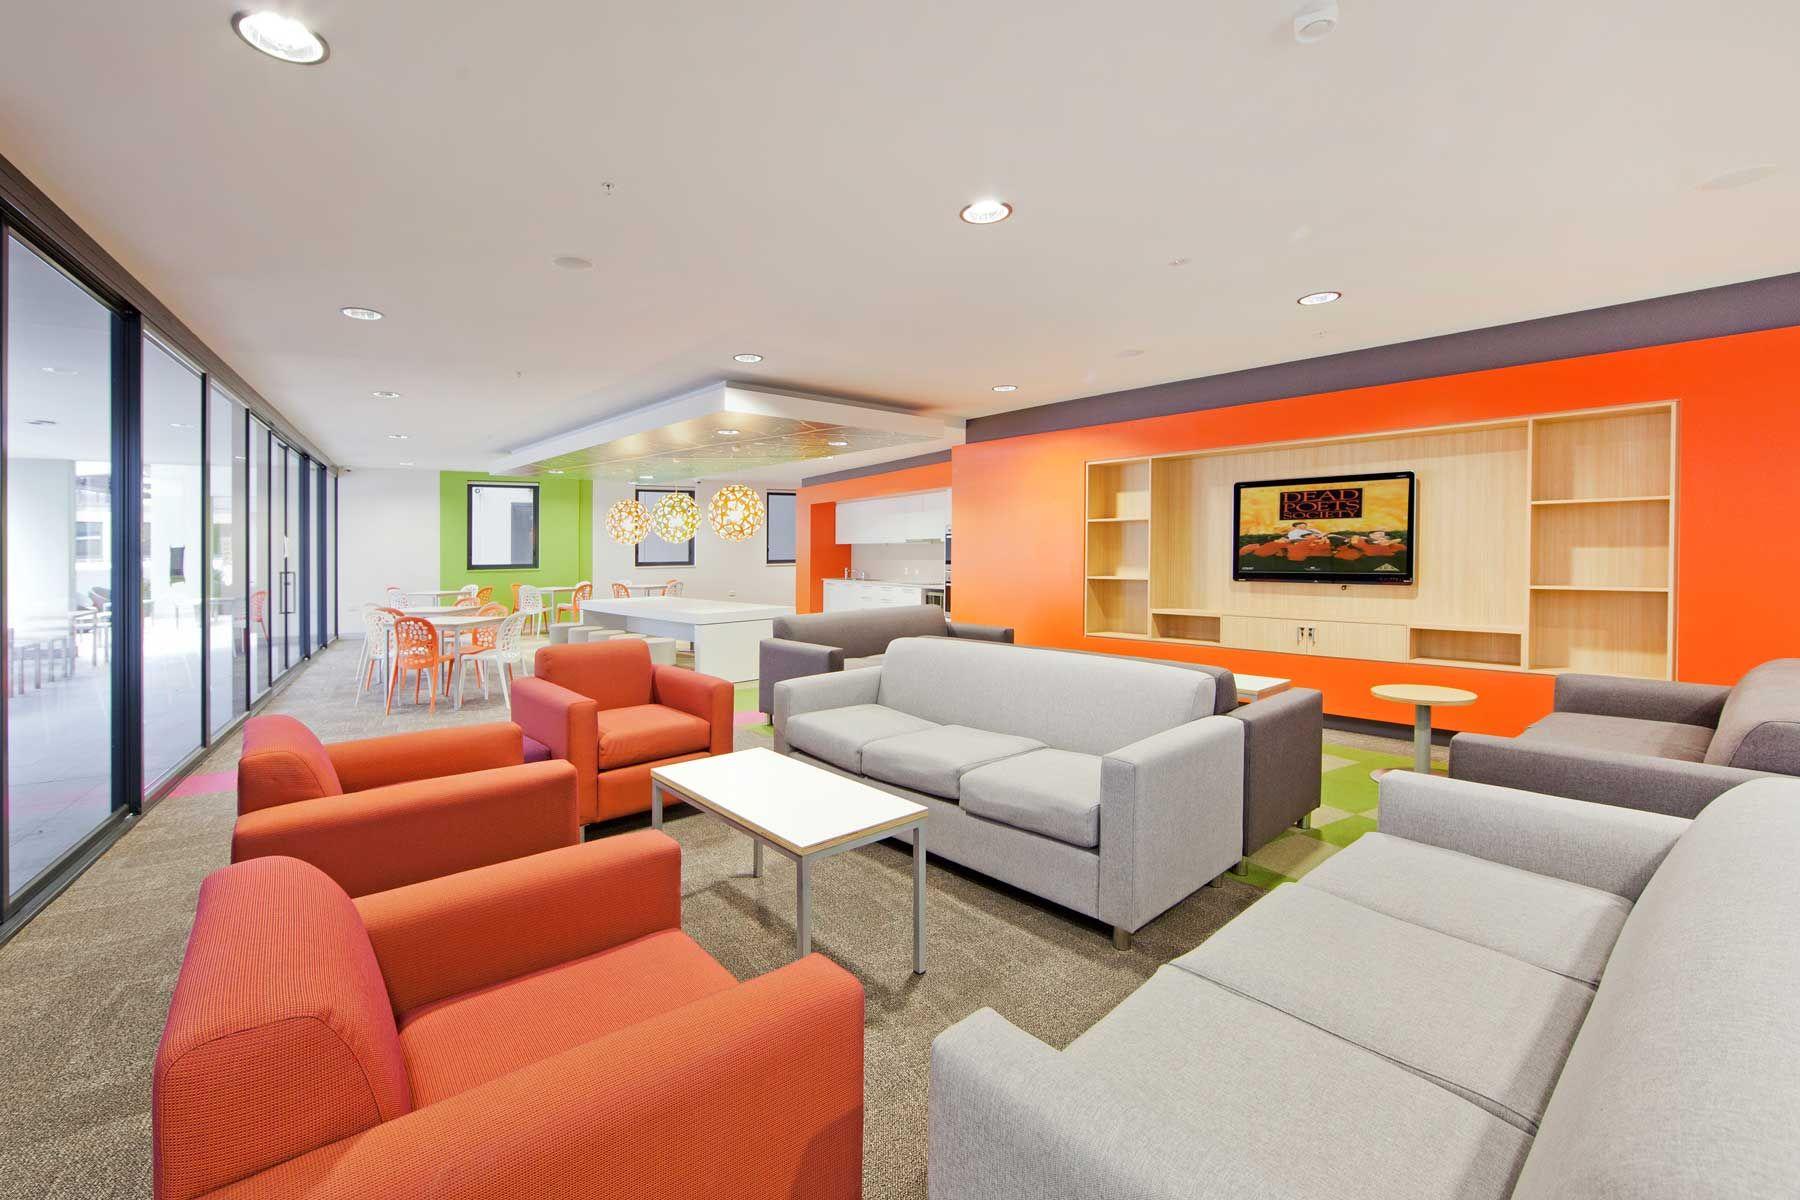 Furniture Design Uts uts-n3531-07 (1800×1200) | shp | pinterest